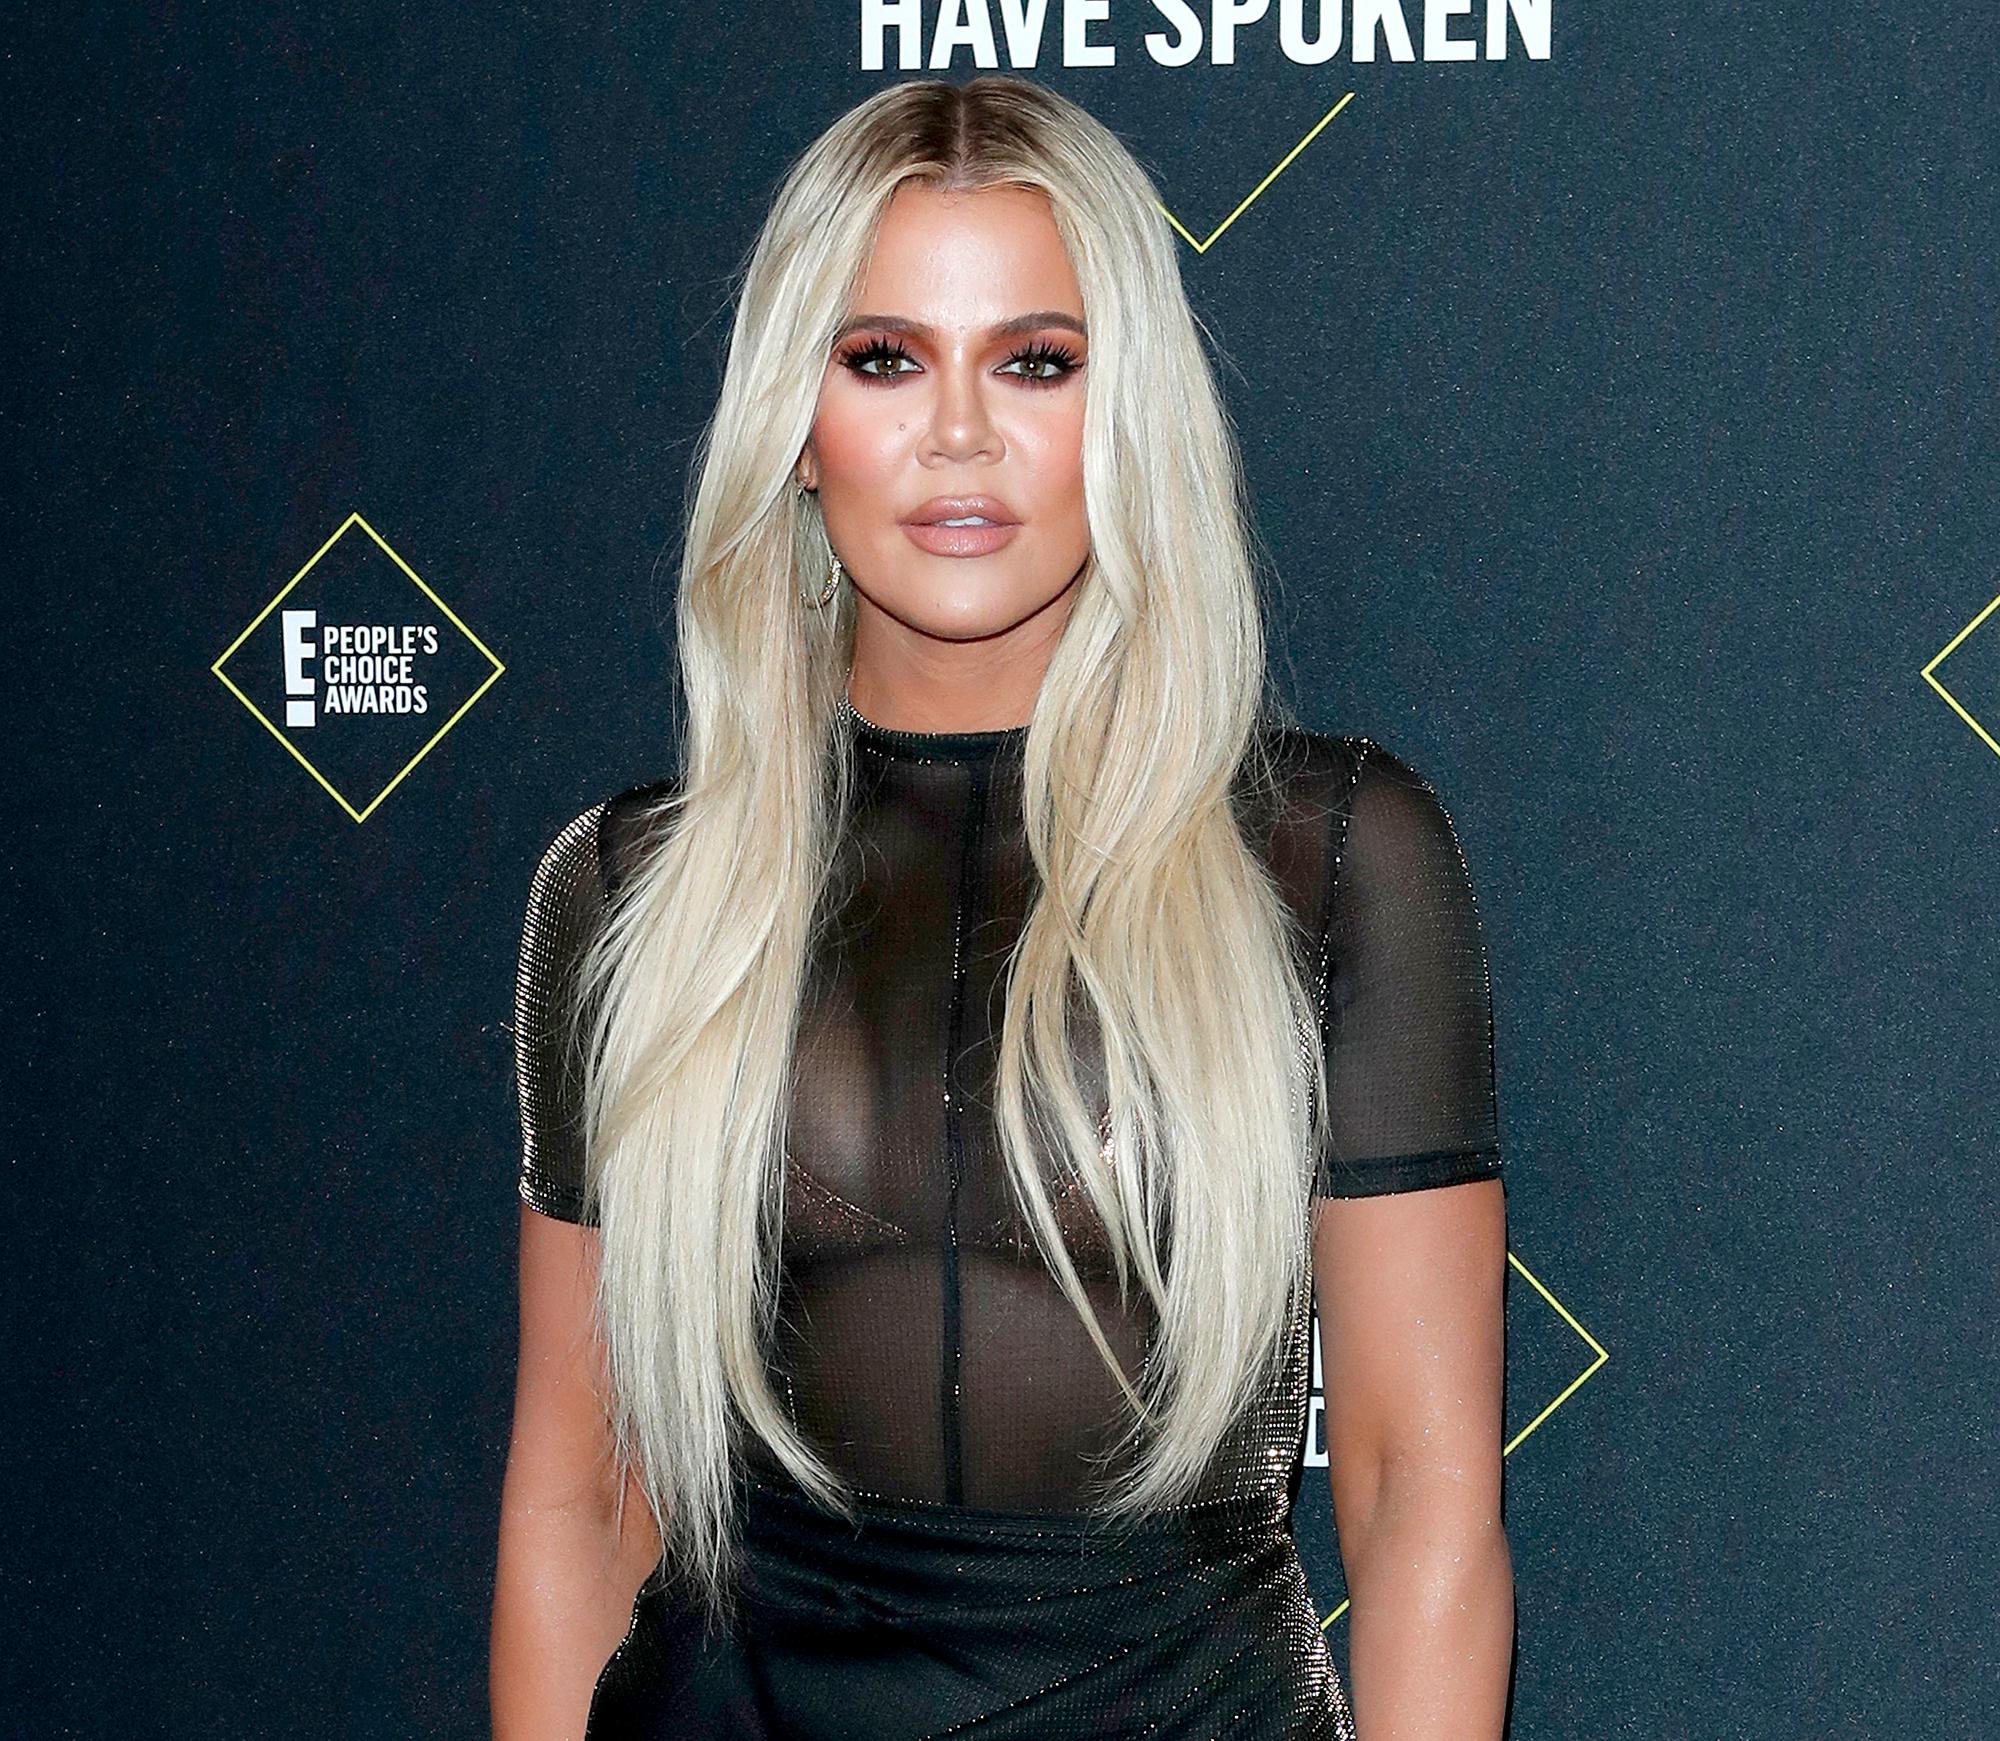 Khloe-Kardashian-Lamar-Odom-and-Sabrina-Parr-engaged